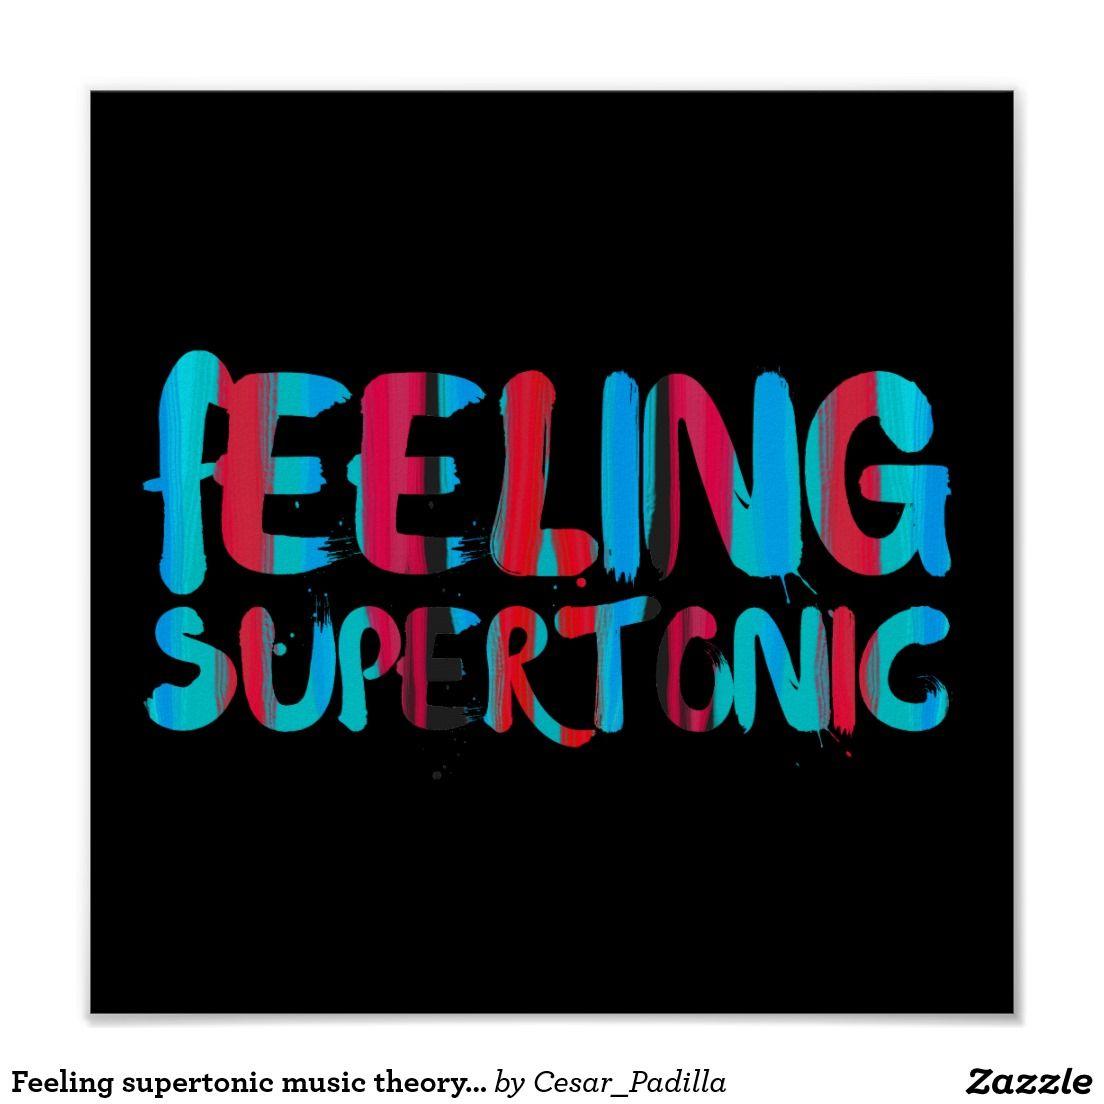 Feeling supertonic music theory pun on black poster   Zazzle.com ...